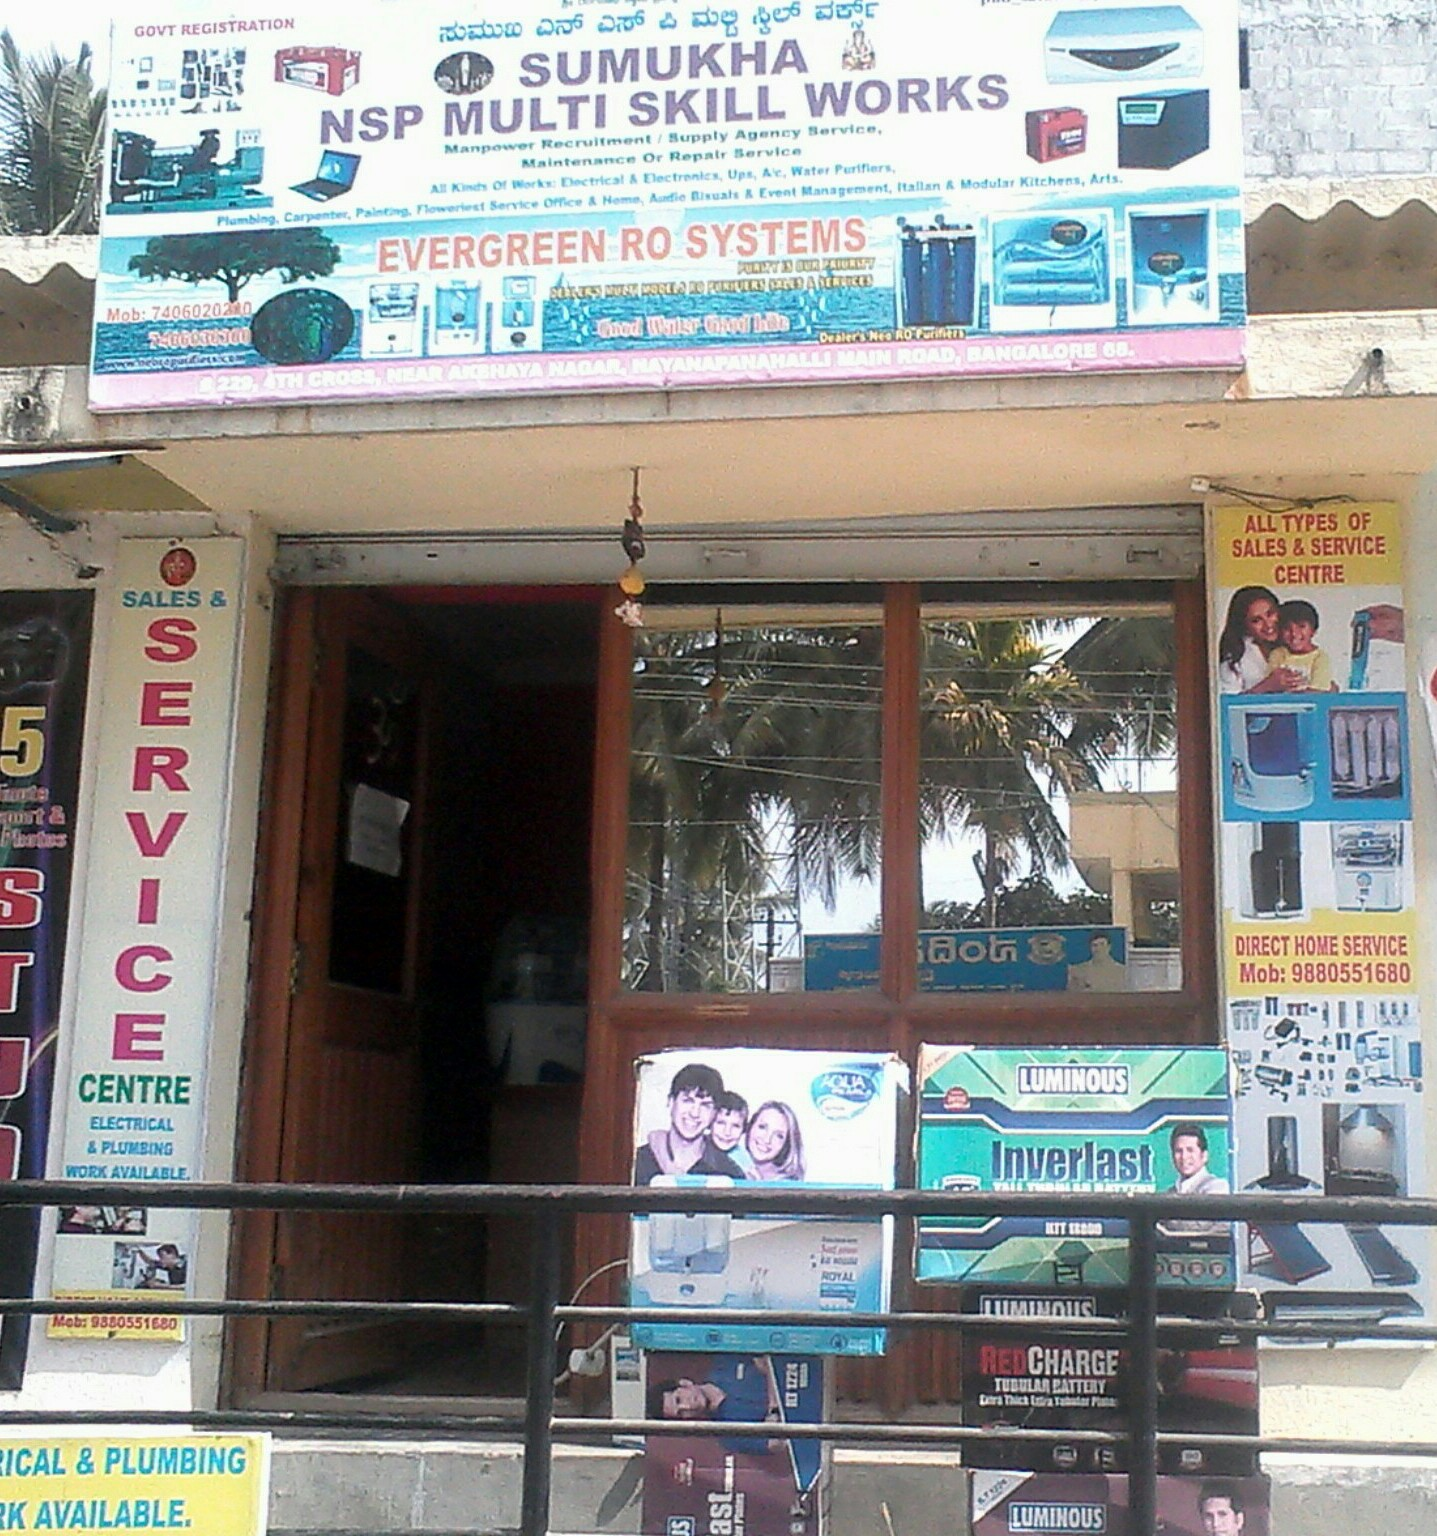 Sumukha Nsp Multi Skill Work Home Appliances Repairs